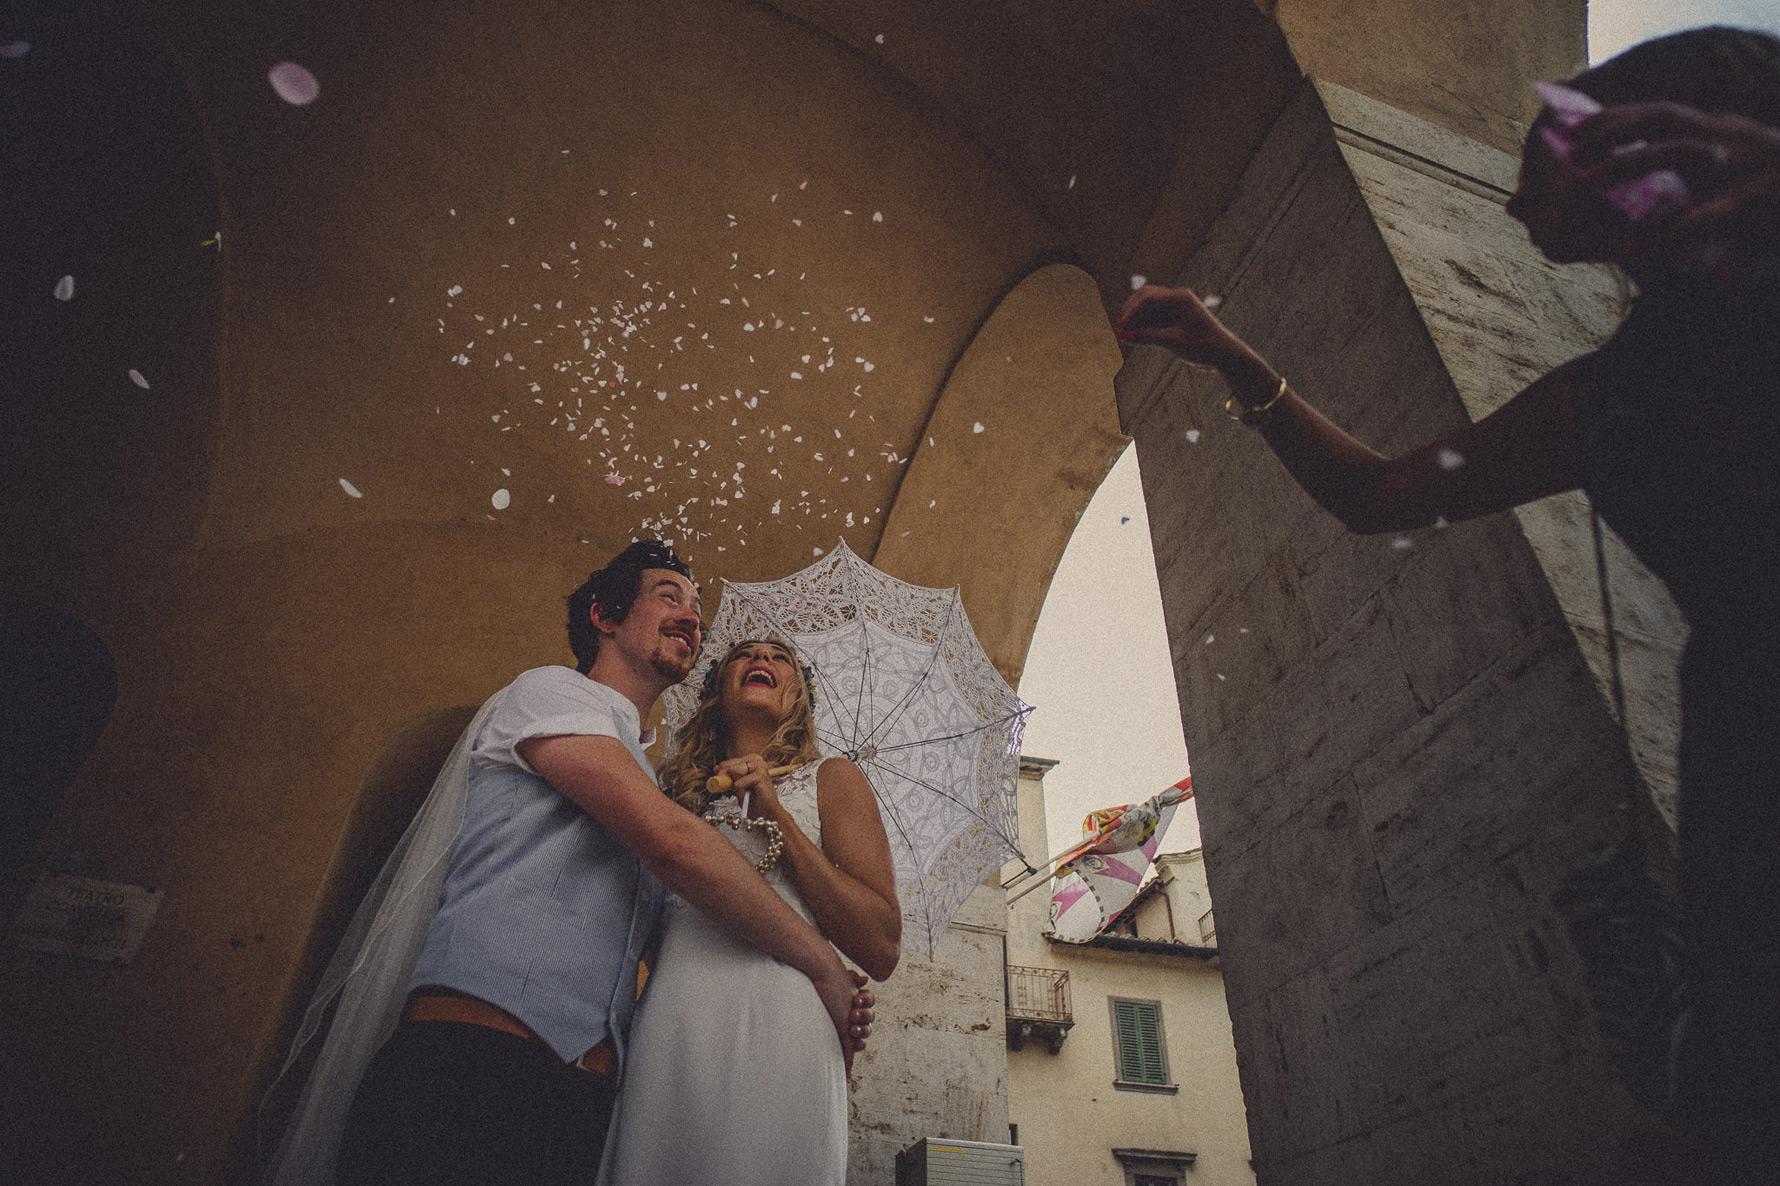 arrischiatti-theathre-wedding-photographer-livio-lacurre-photogr